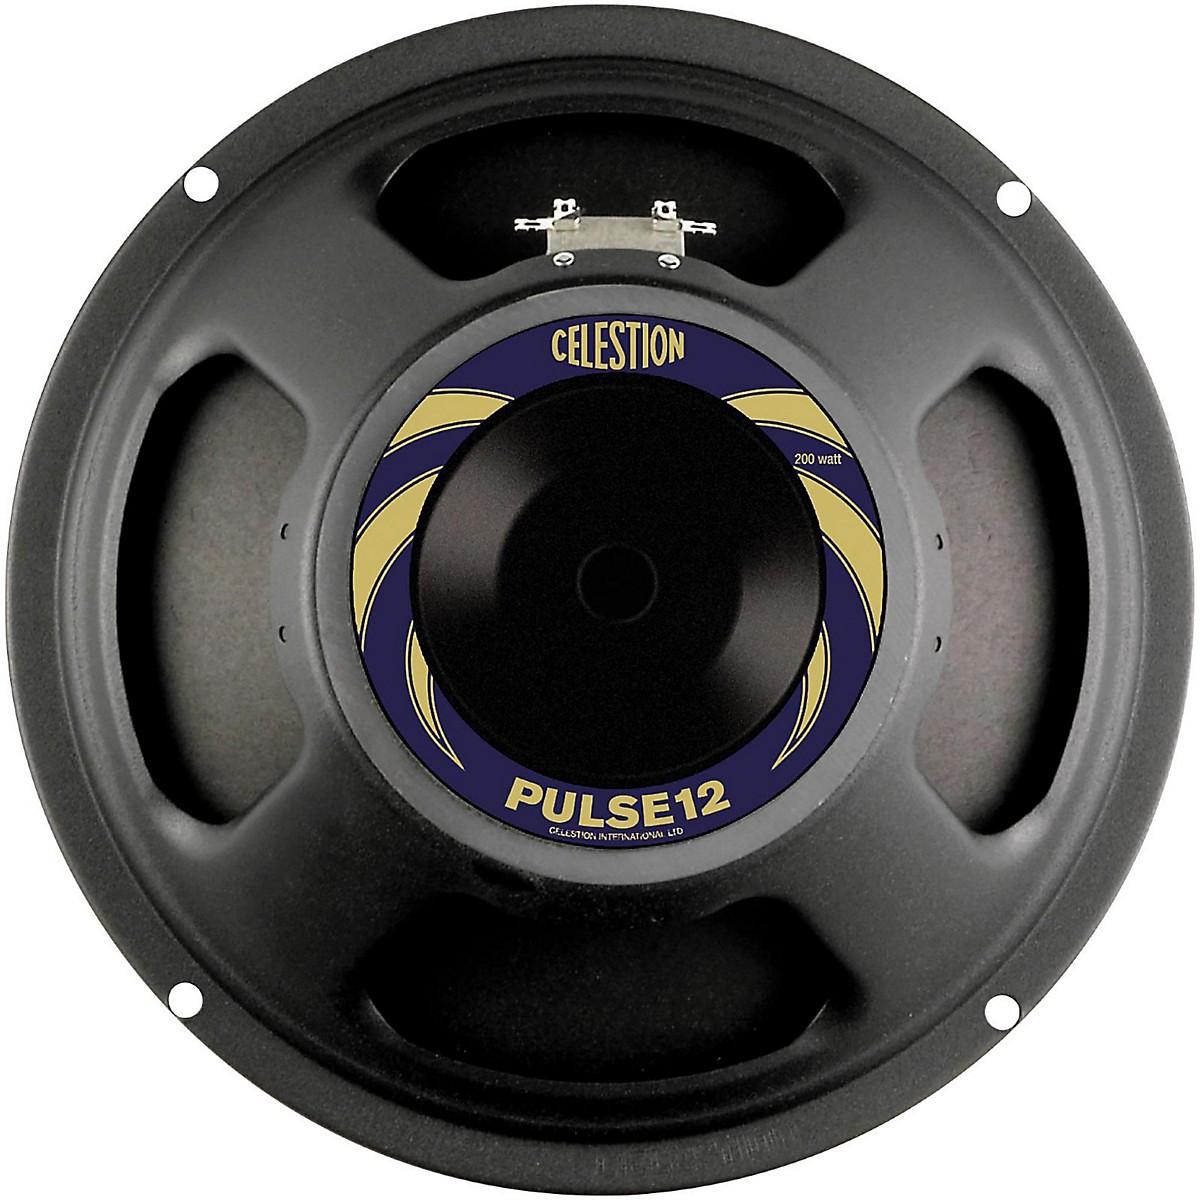 Celestion Pulse Series 12 Inch 200 Watt 8 ohm Ceramic Bass Replacement Speaker